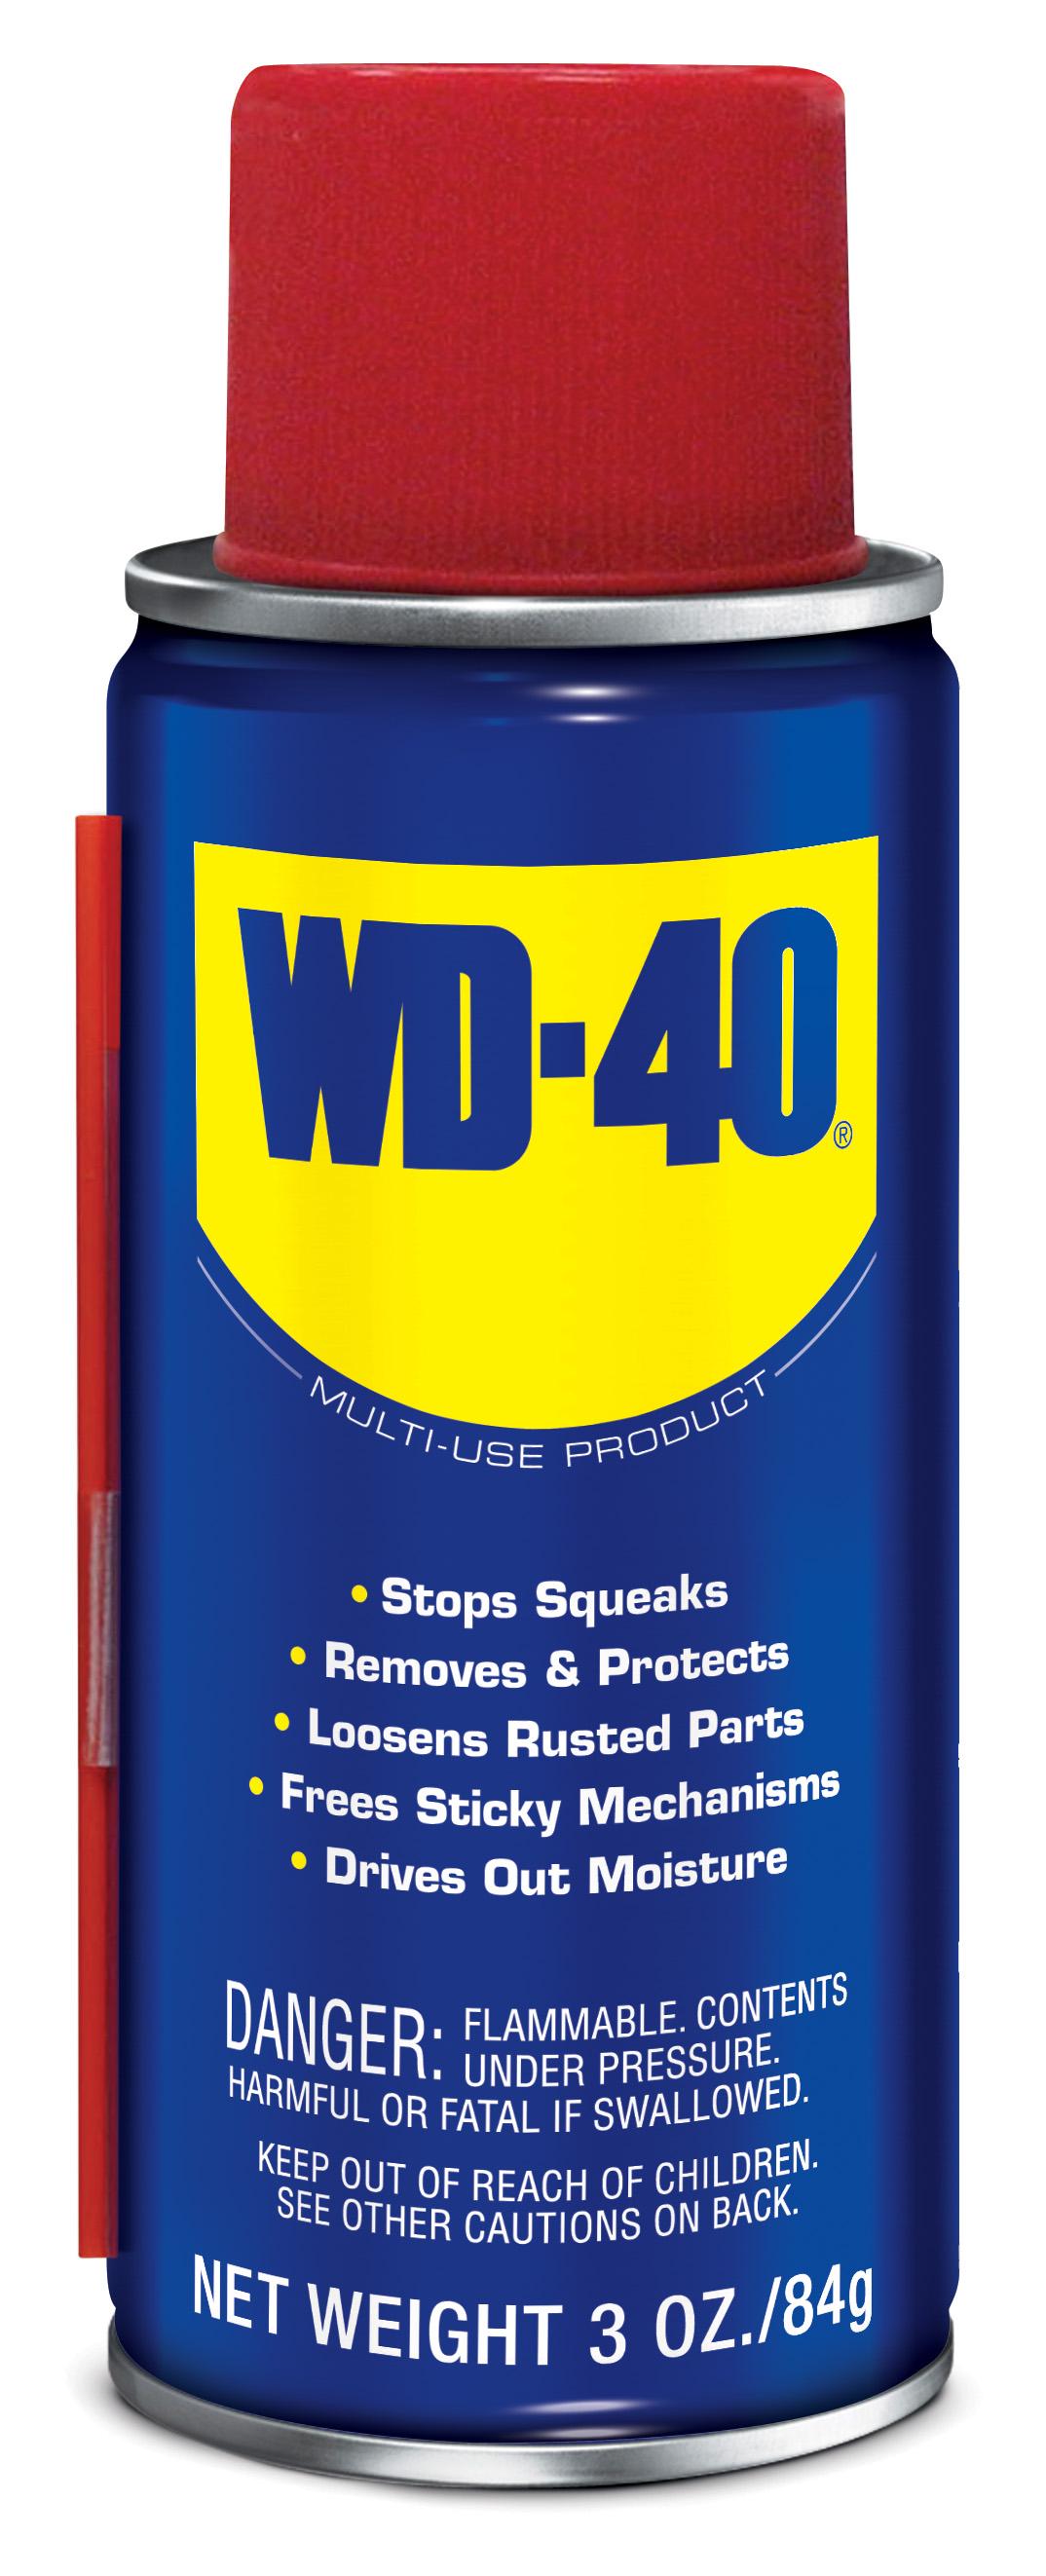 wd-40-smart-straw-voc-3oz-3d-can